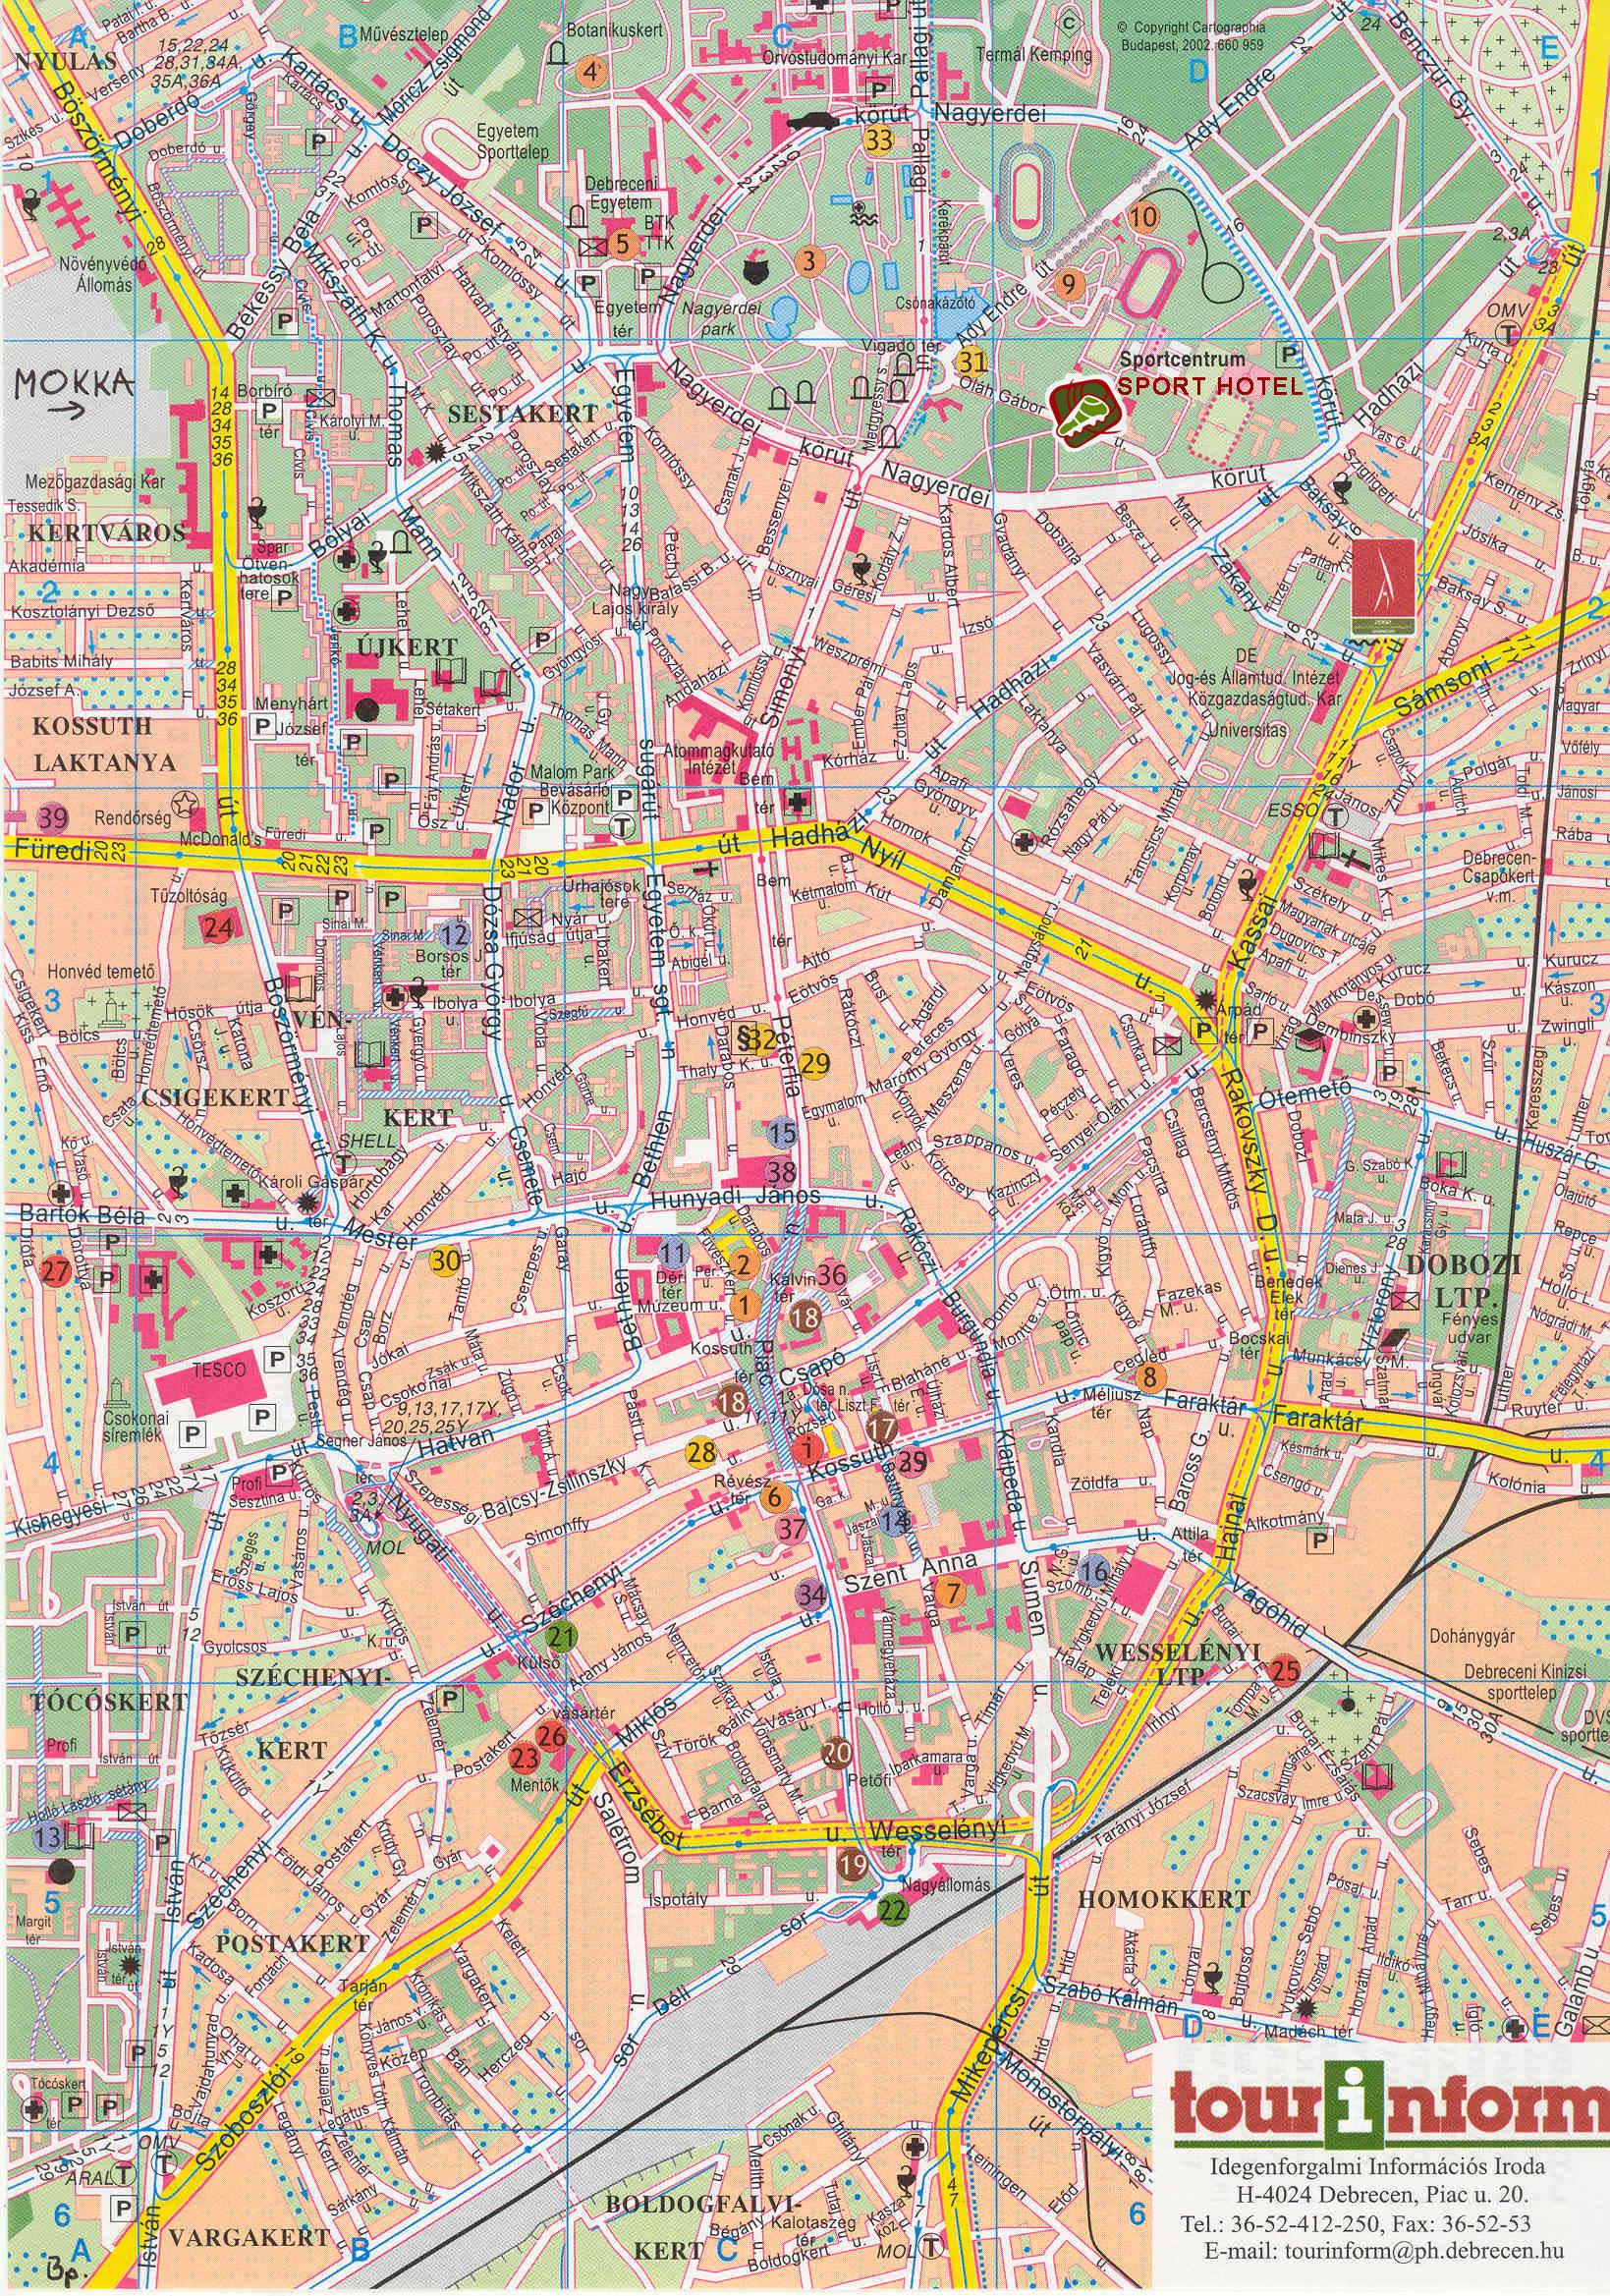 debrecen térkép Debrecen: Debrecen térkép (kép)